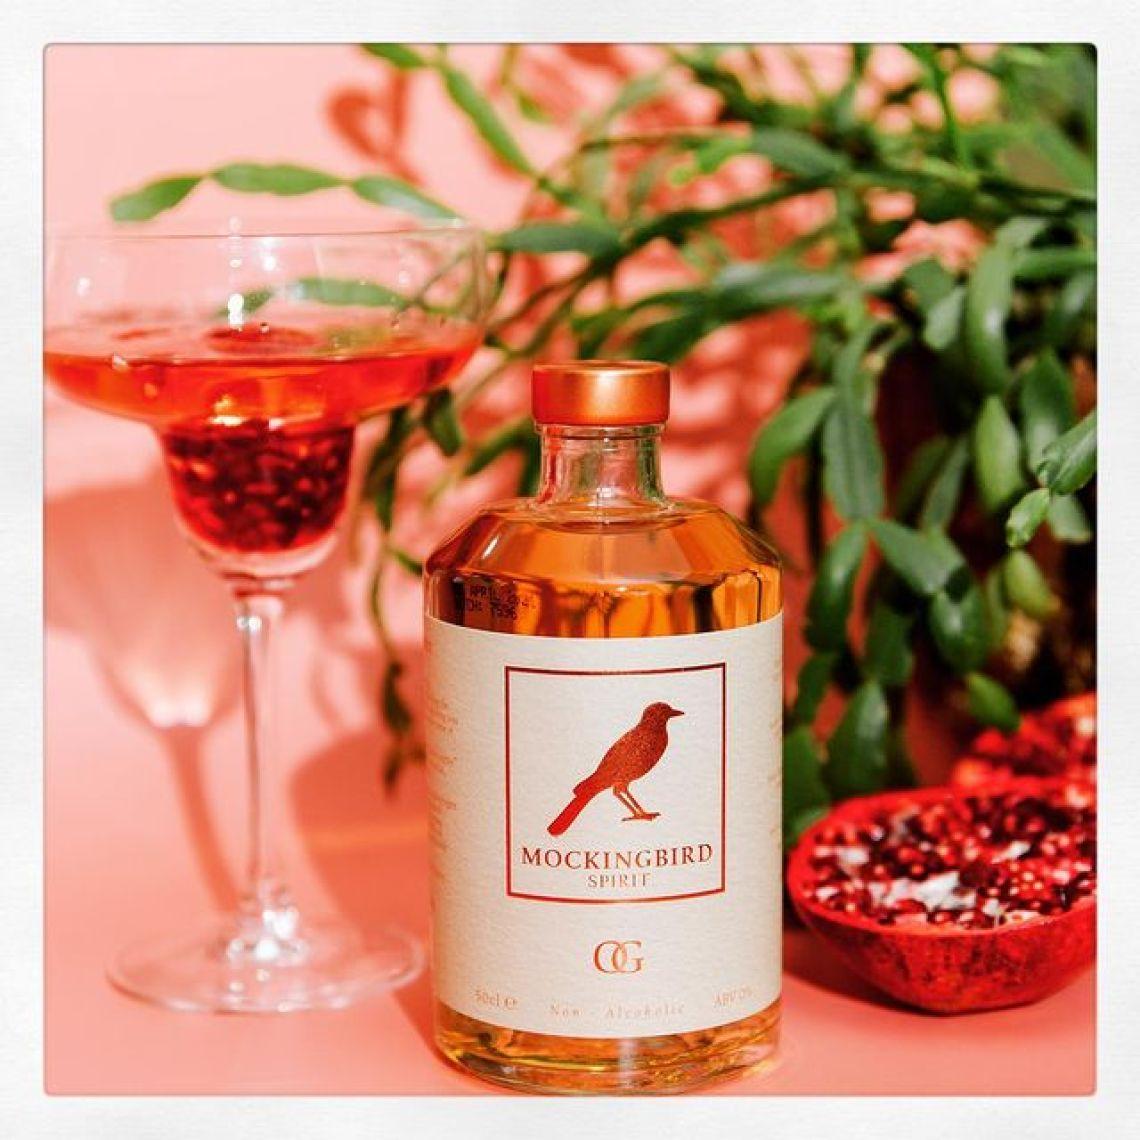 Mockingbird Spirit - Alcohol Free Drinks - Female Original